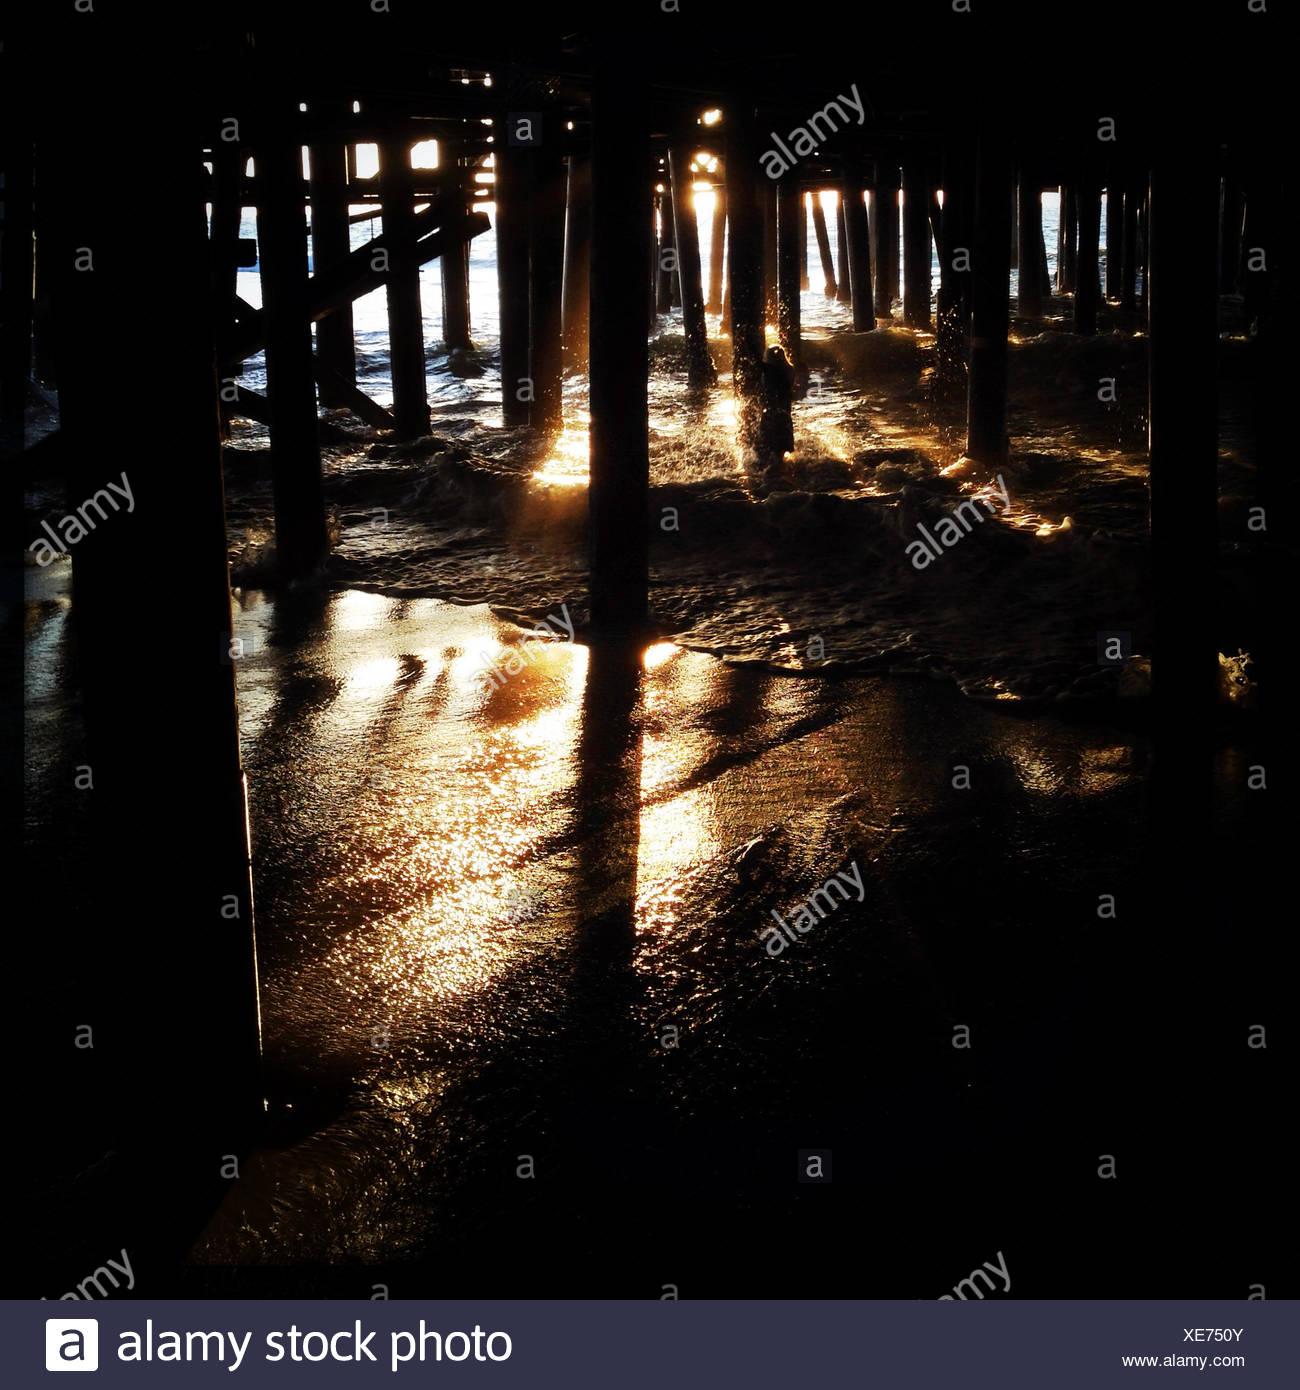 USA, California, Santa Monica, In Woods, Under Santa Monica Pier - Stock Image